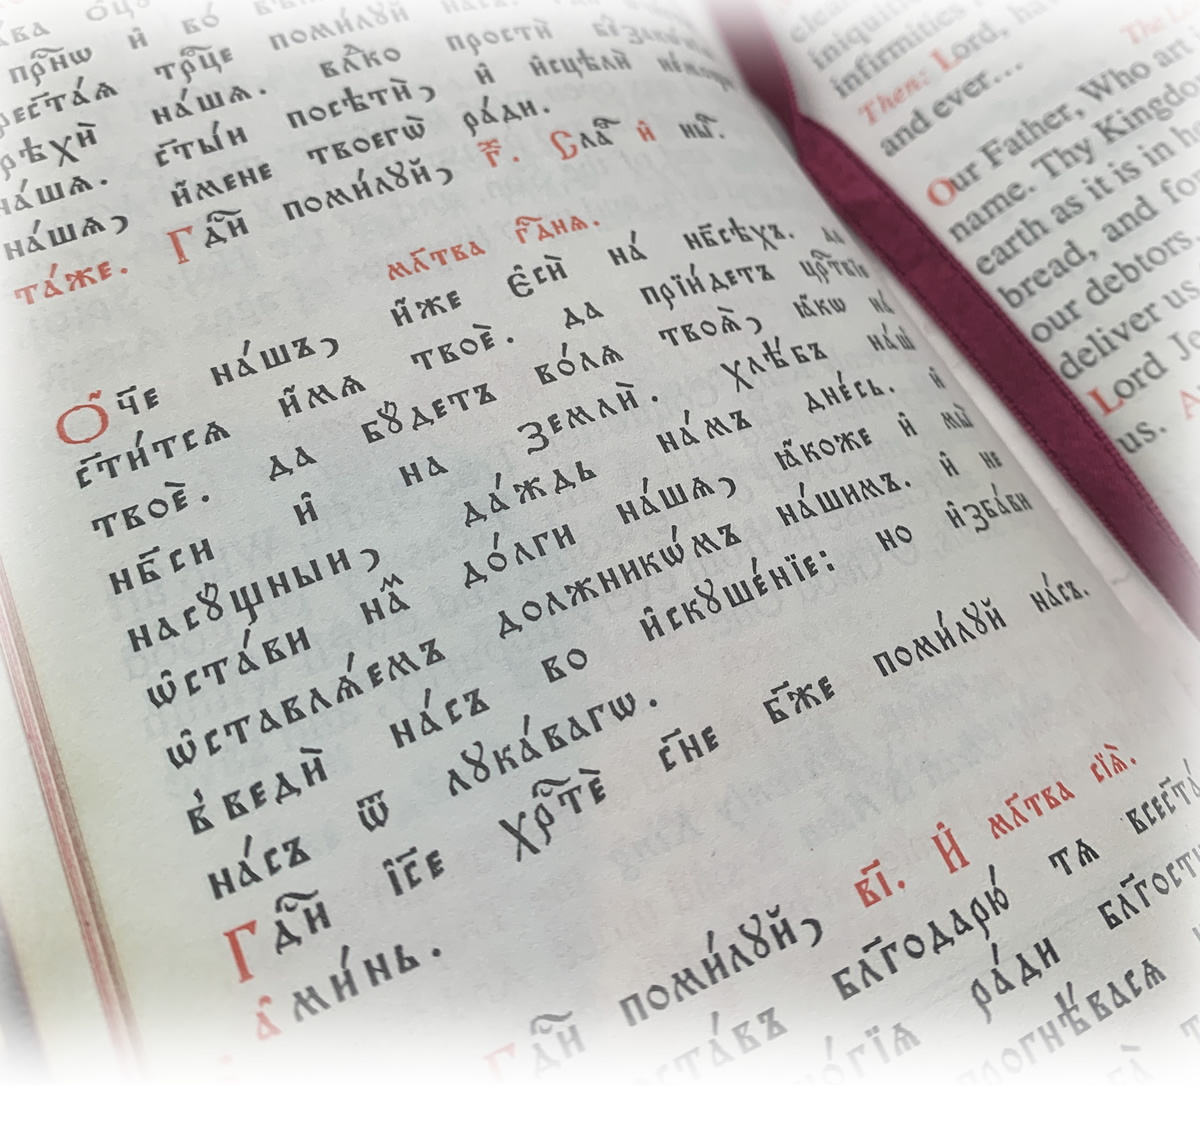 The Church Slavonic E-Tutor